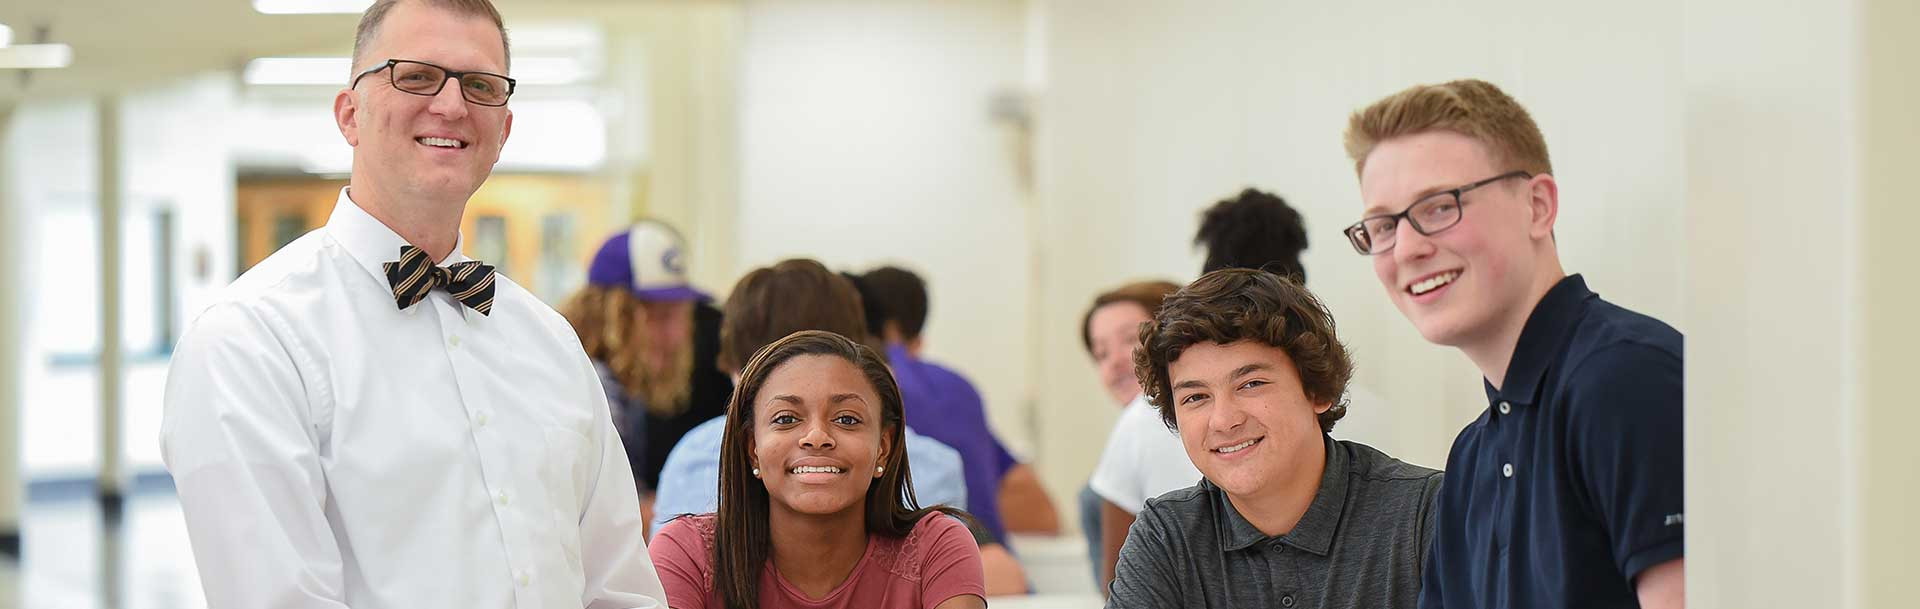 NorfolkChristianSchool-VA-Private-StudentswithTeacher-Banner-2020